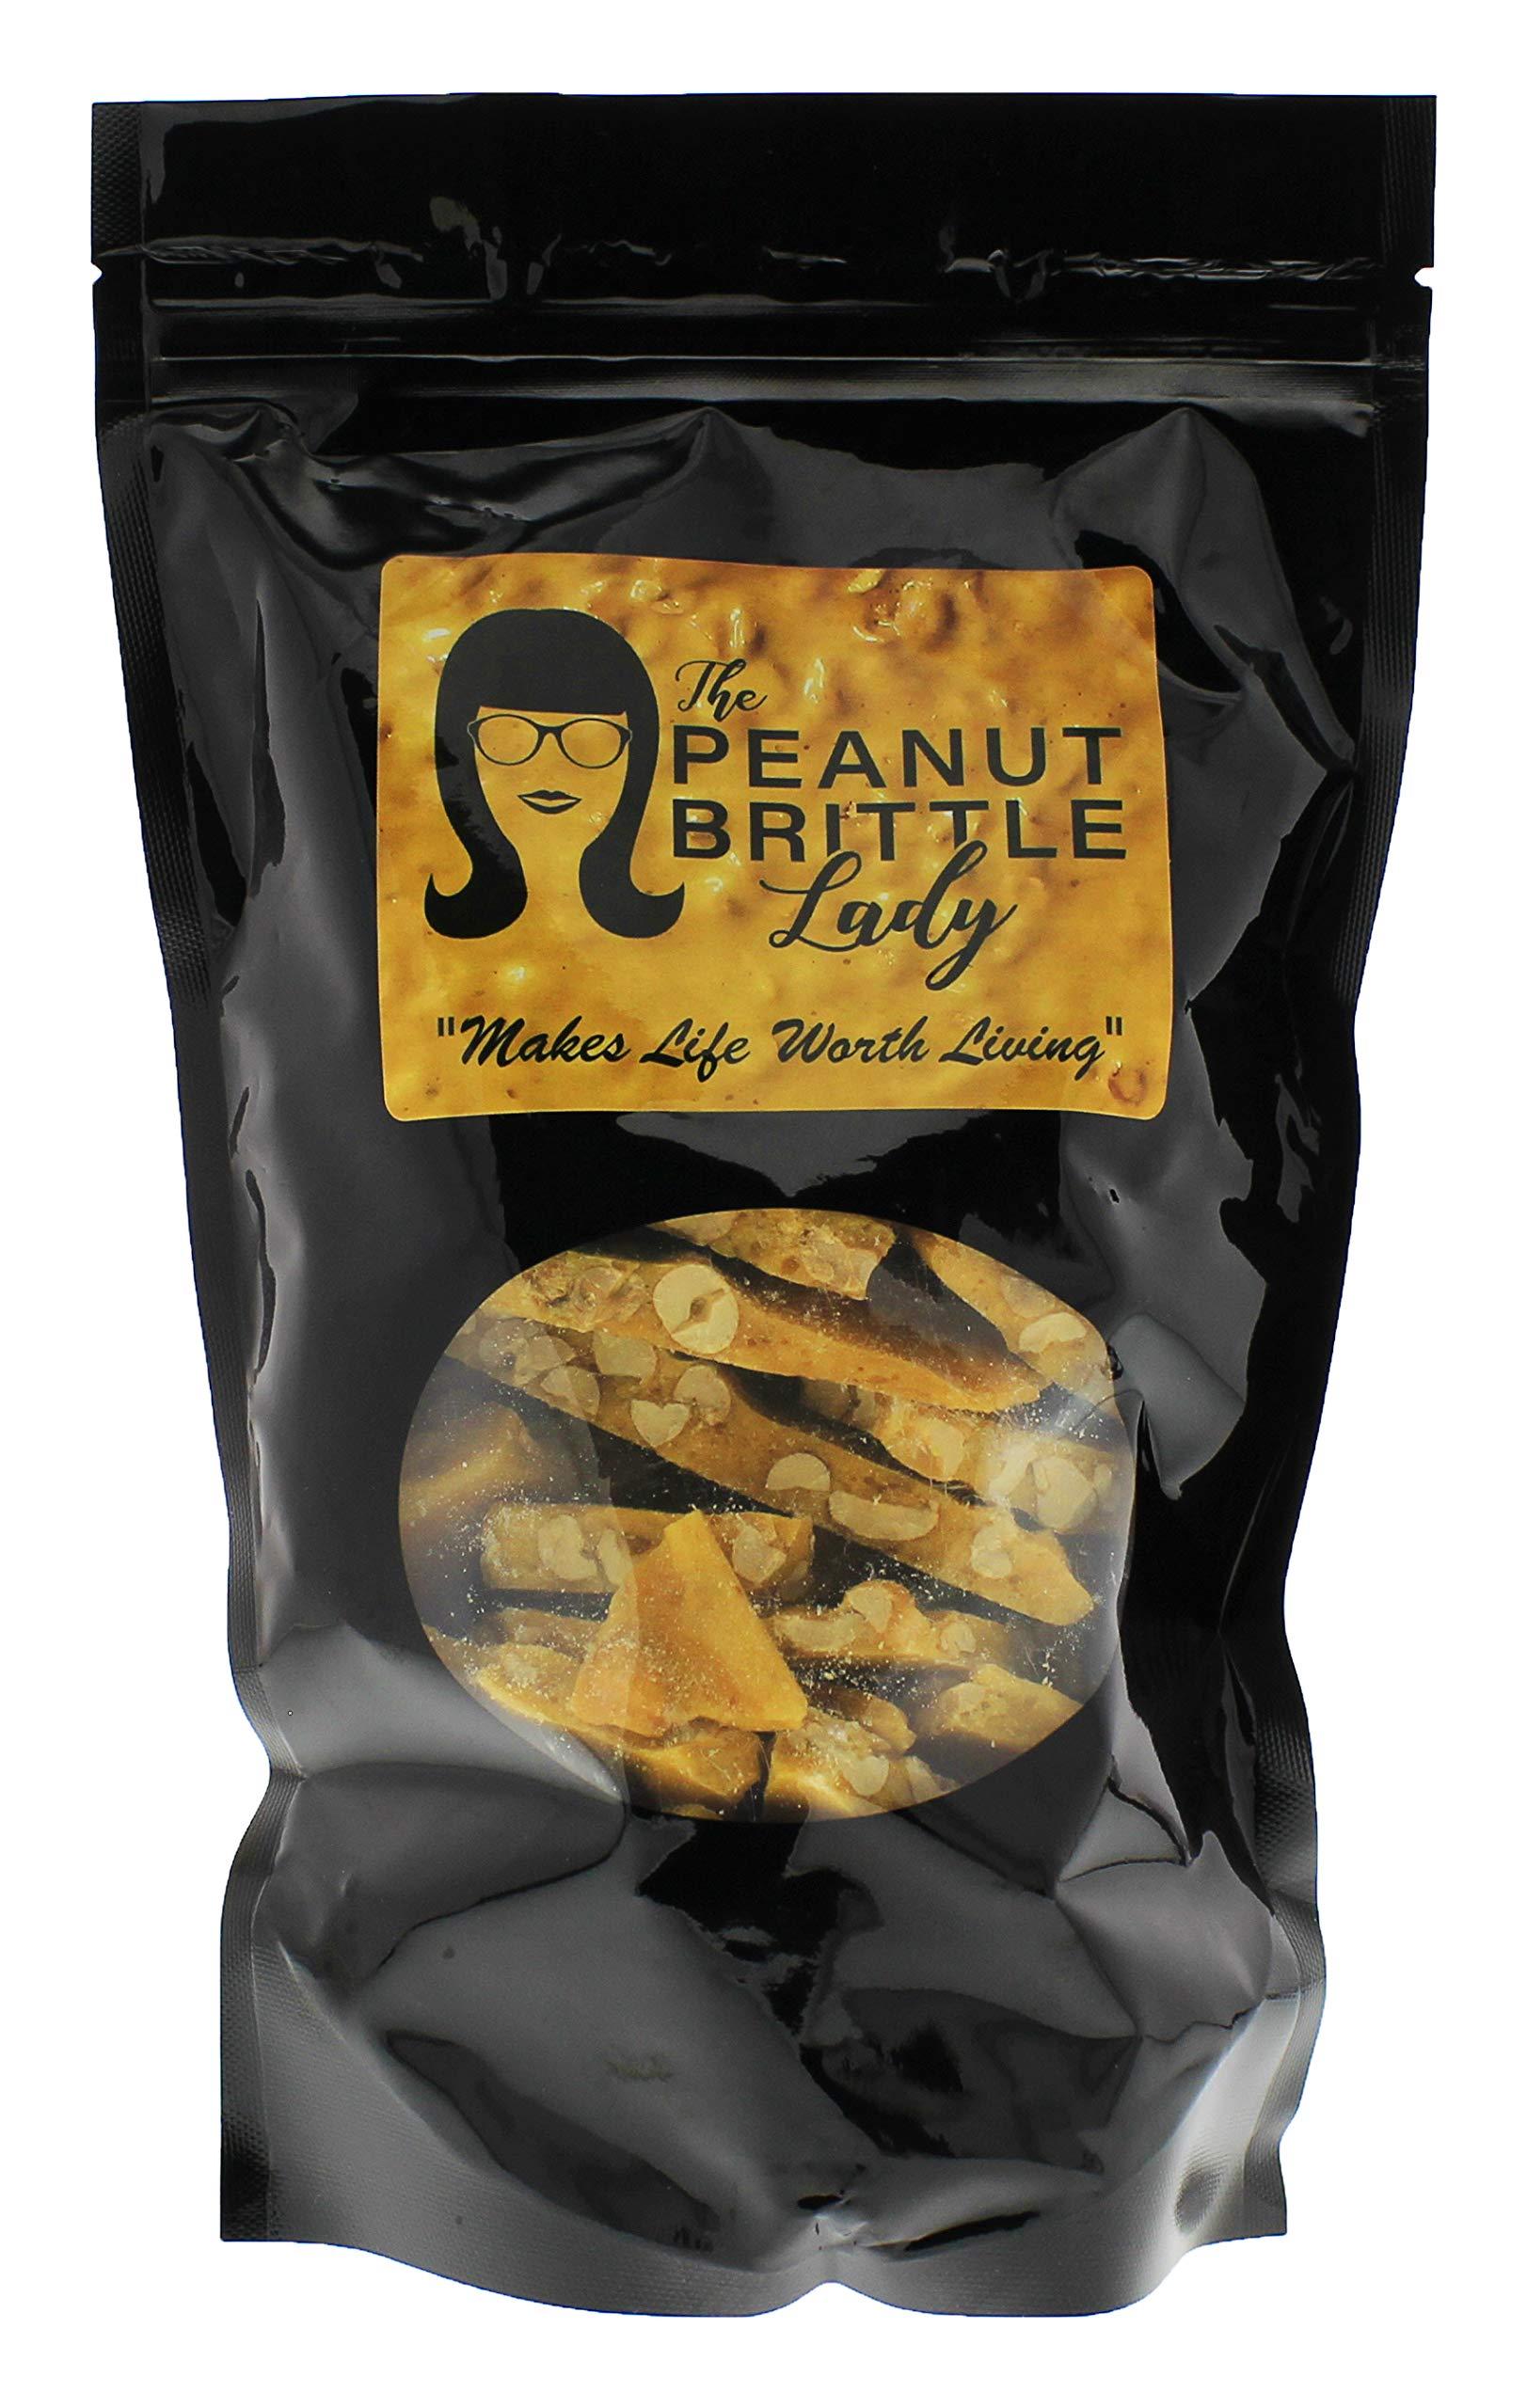 Top Shelf Handmade Gourmet Peanut Brittle Candy, Small Batch, Homemade; Size: Crazy Eight (8 oz)